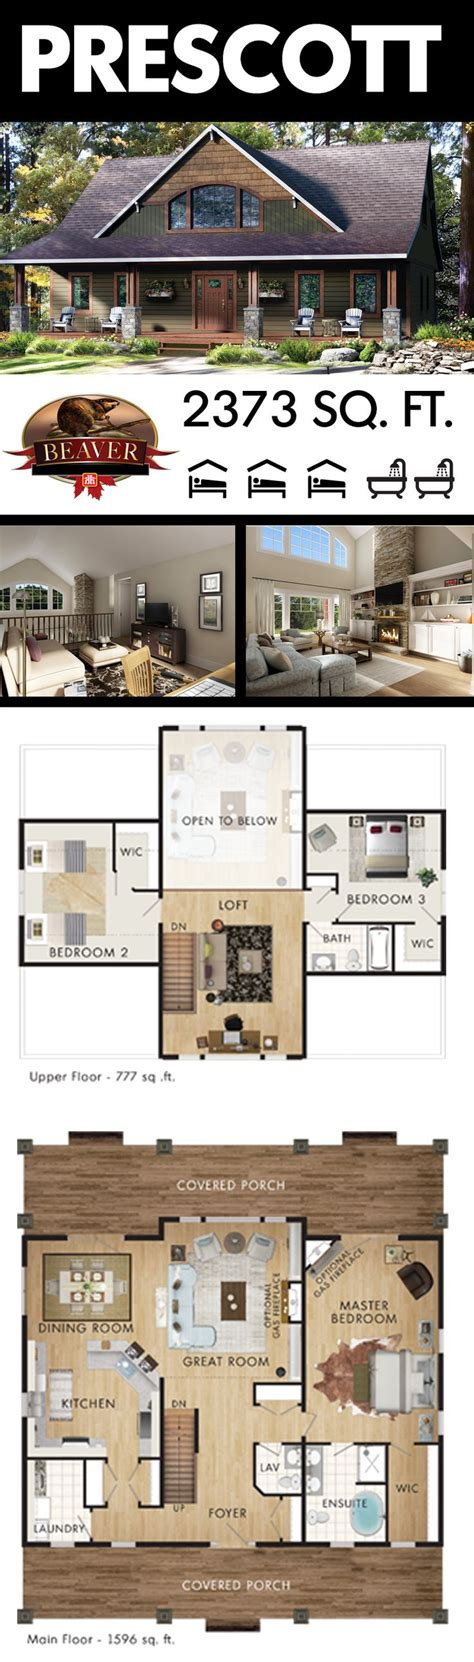 multi family house plans apartment multi family house plans apartment